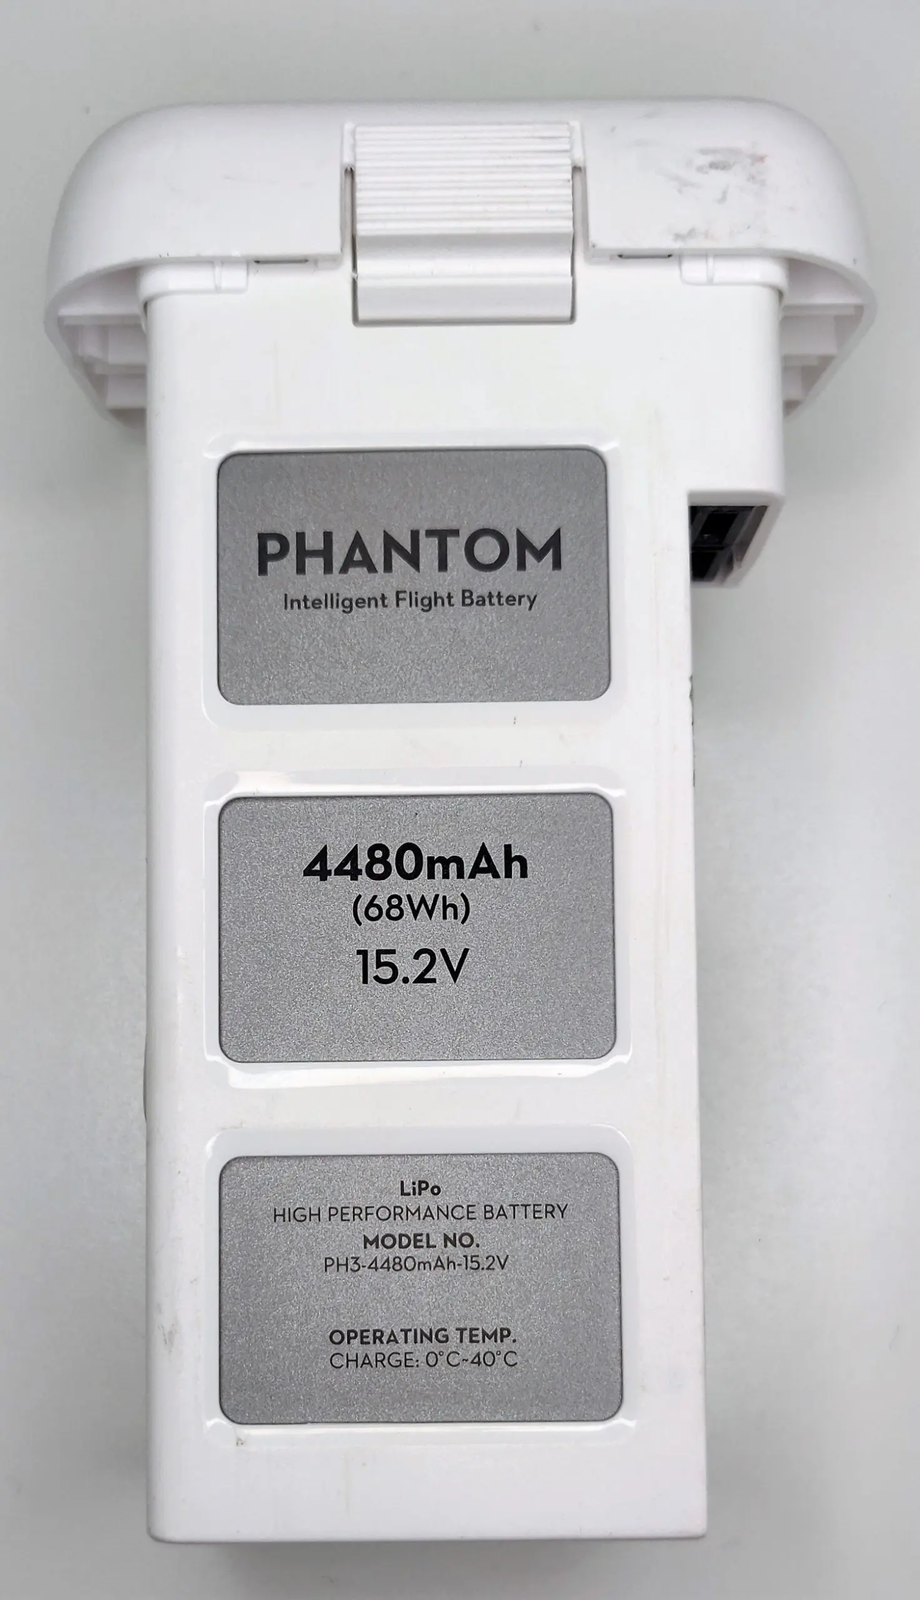 Genuine DJI Phantom 3 Battery - Life unknown